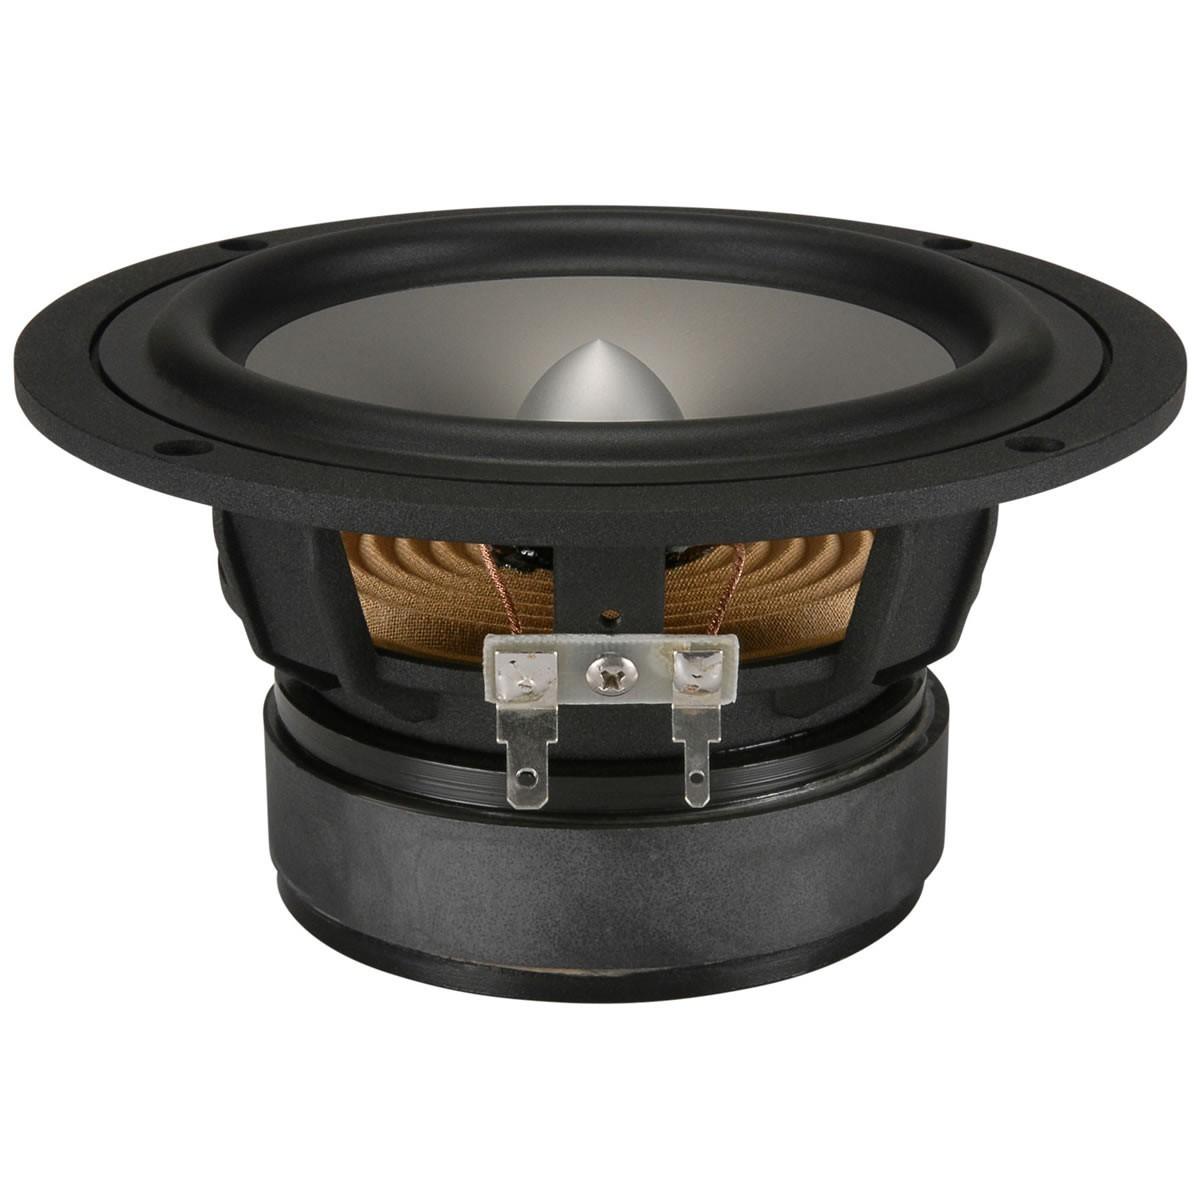 FOUNTEK FW146 Speaker Driver Midrange 35W 8 Ohm 86dB 45Hz - 4000Hz Ø14.6cm